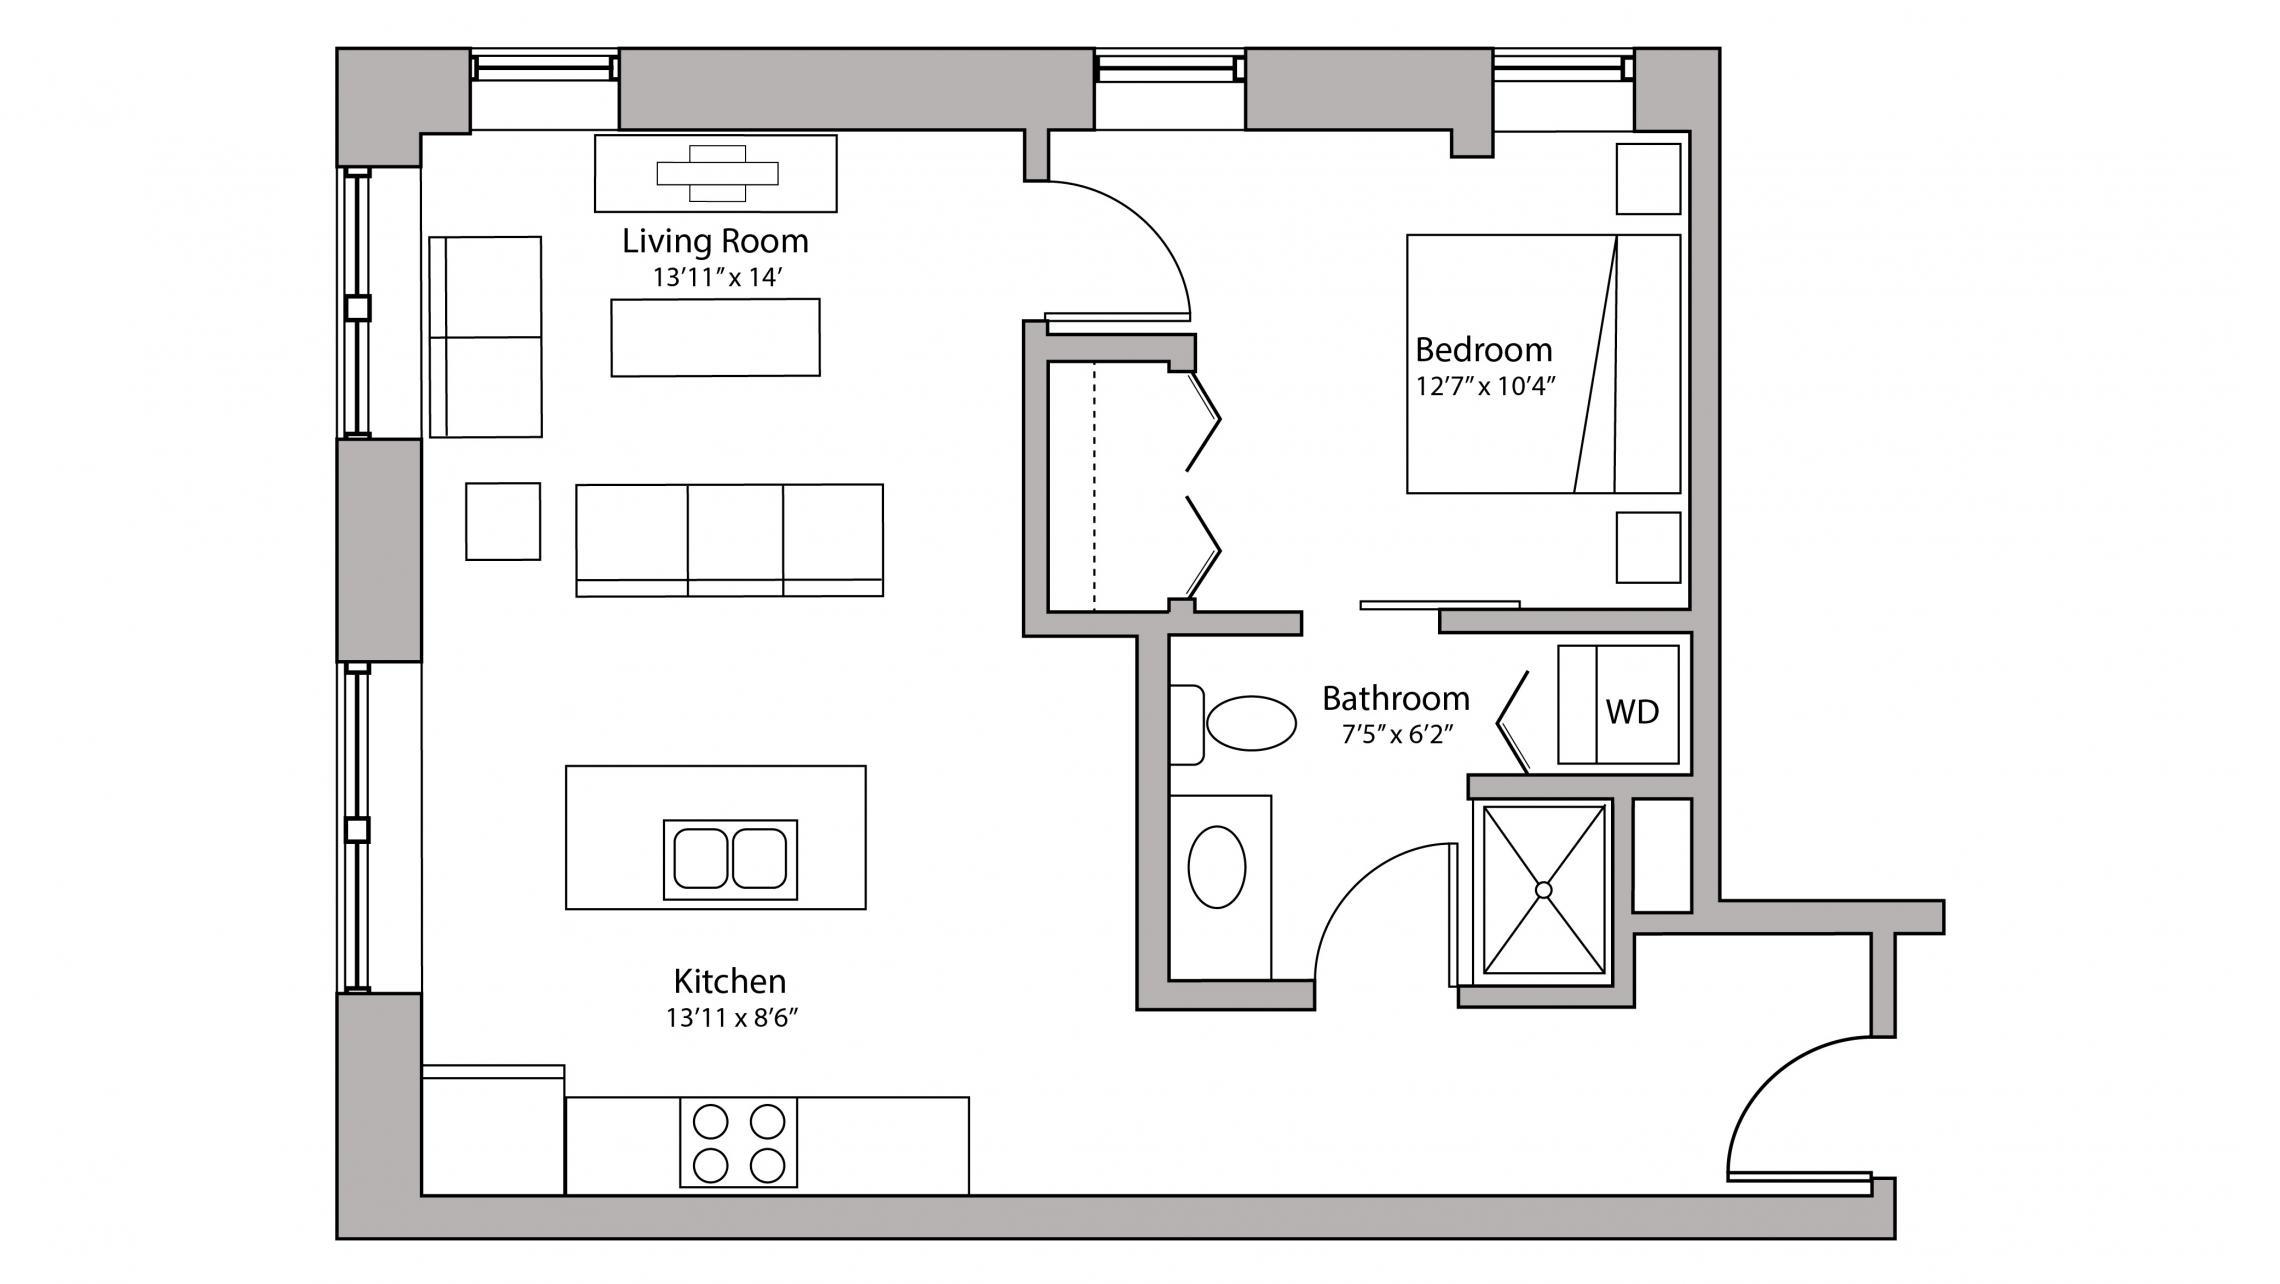 ULI Capitol Hill 307 - One Bedroom, One Bathroom